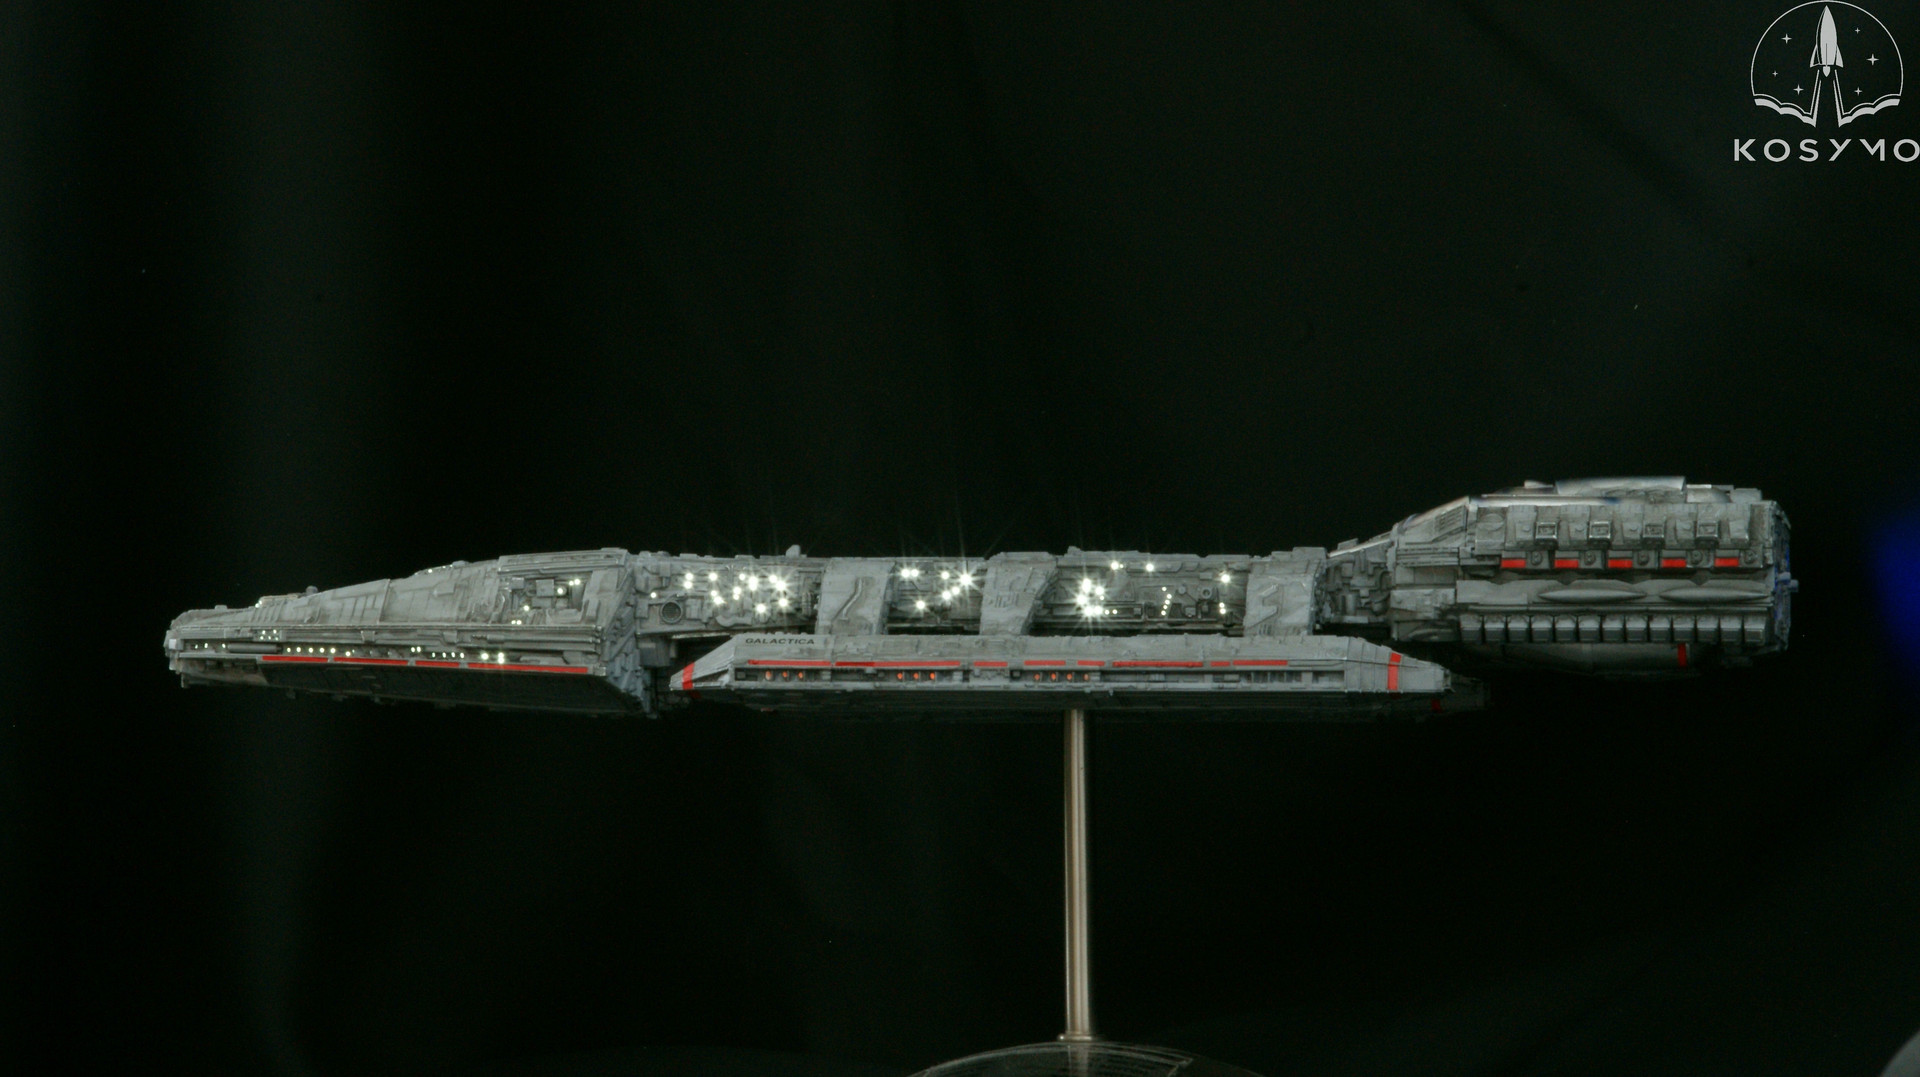 Galactica_025.JPG